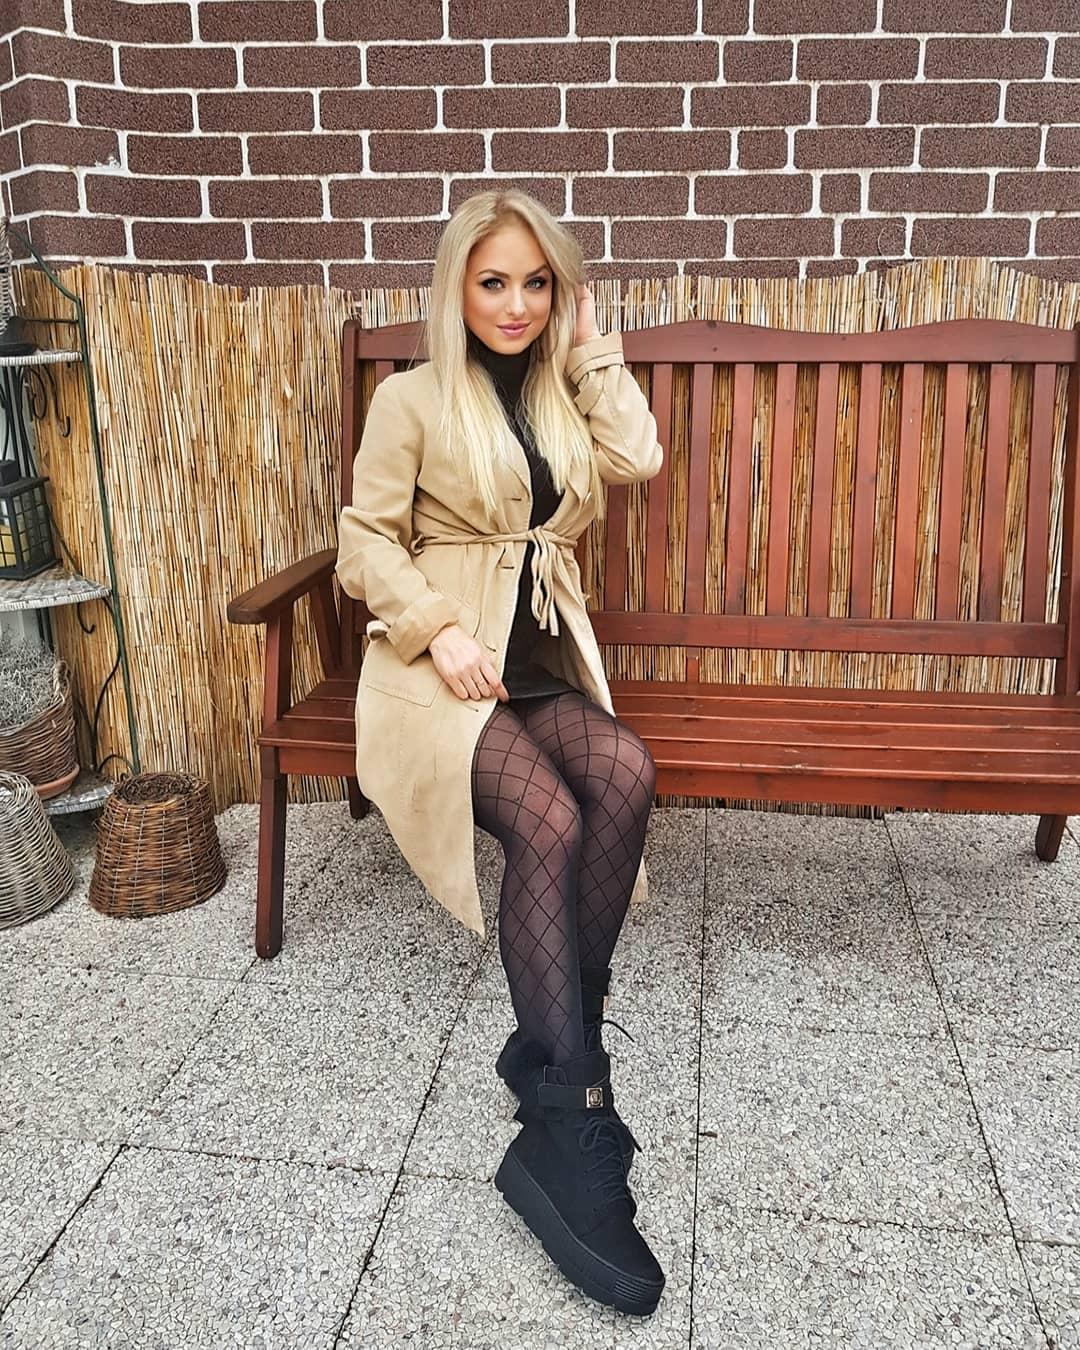 Veronica-Hunkova-Wallpapers-Insta-Fit-Bio-10